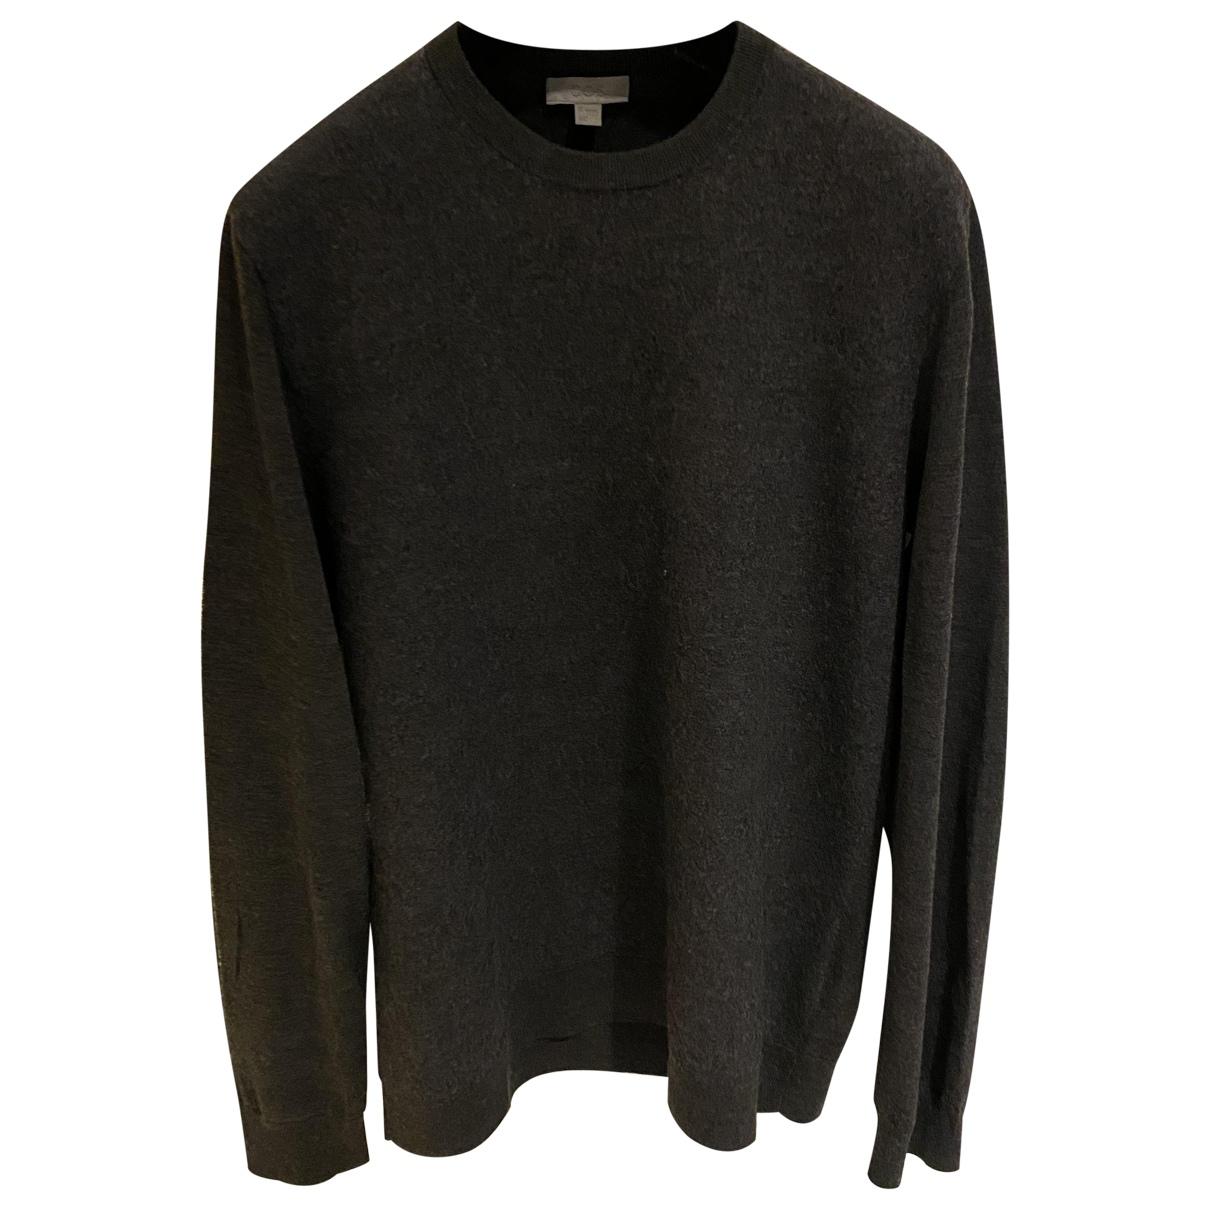 Cos N Grey Wool Knitwear & Sweatshirts for Men L International